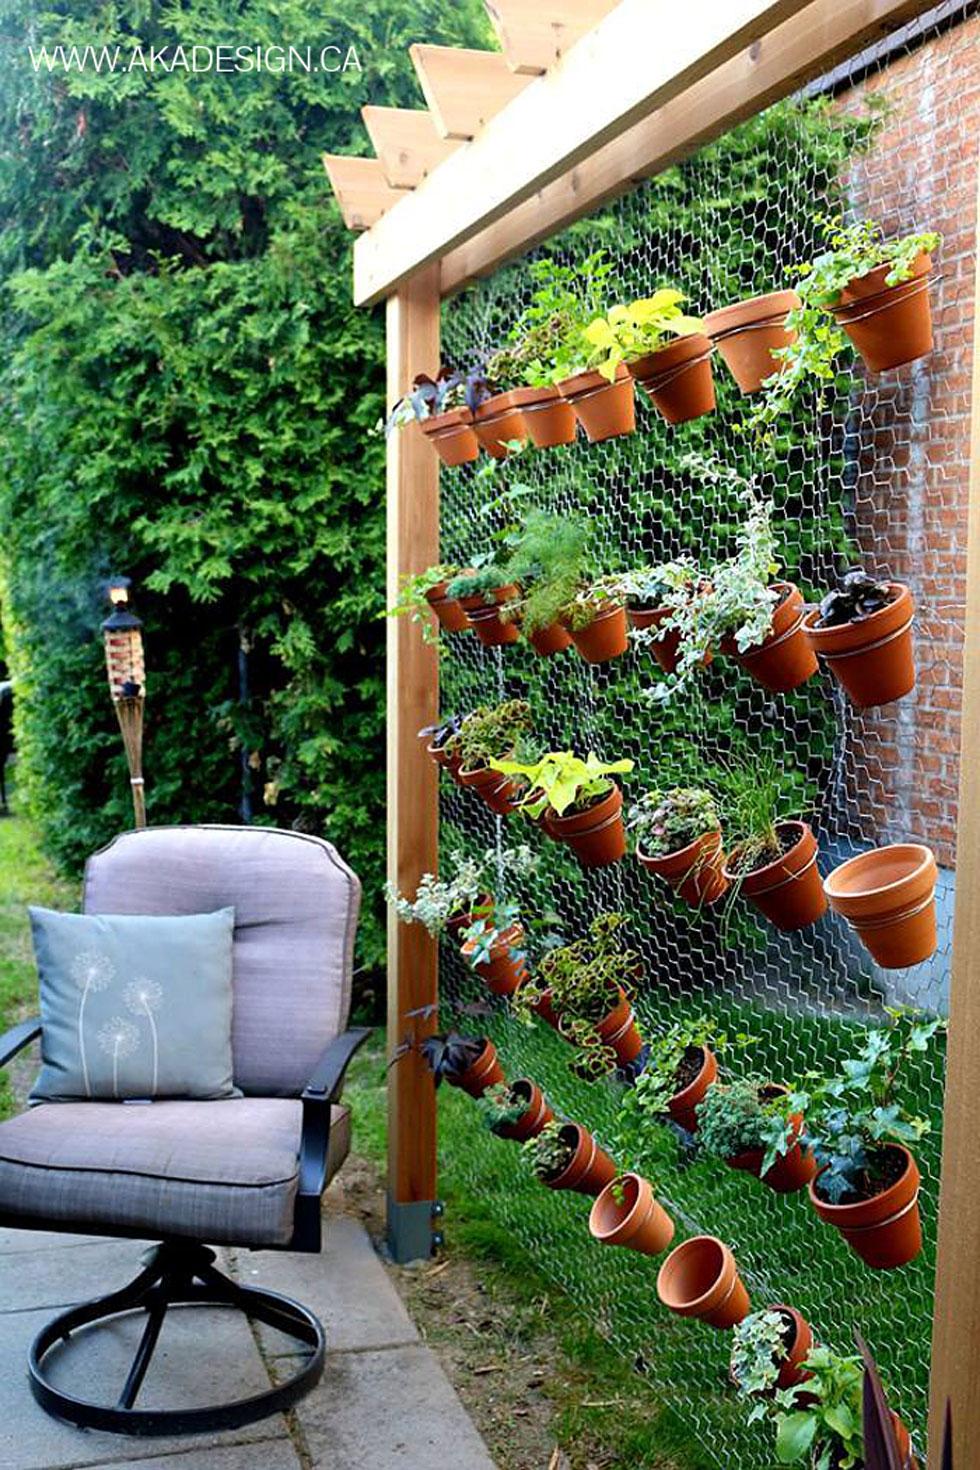 Backyard Landscape: 16 Amazing DIY Patio Decoration Ideas ... on Diy Back Patio Ideas id=93597